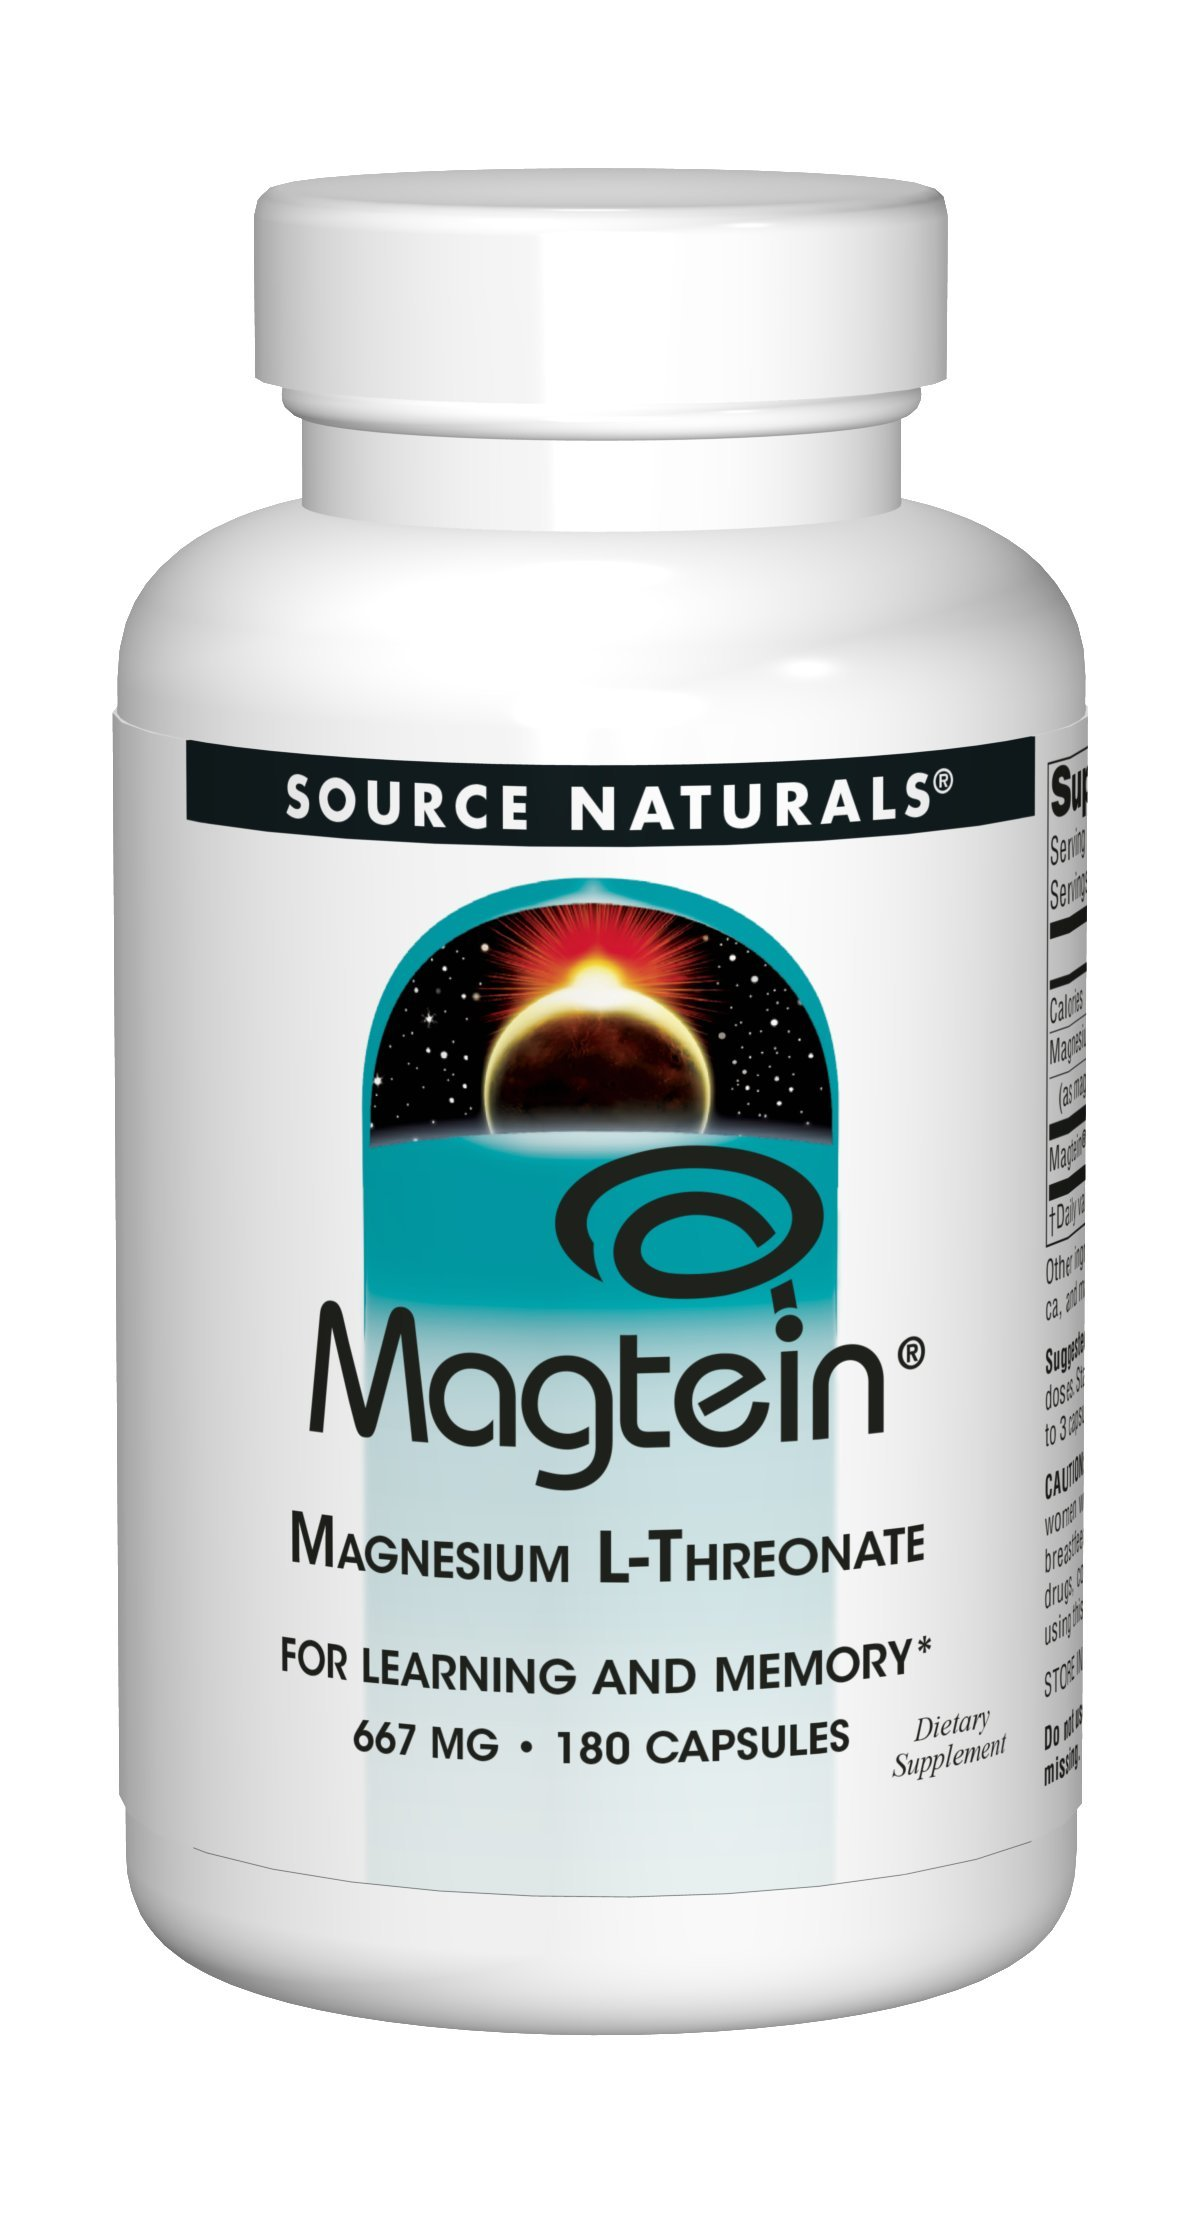 Magtein Source Naturals, Inc. 180 Caps (667 MG)